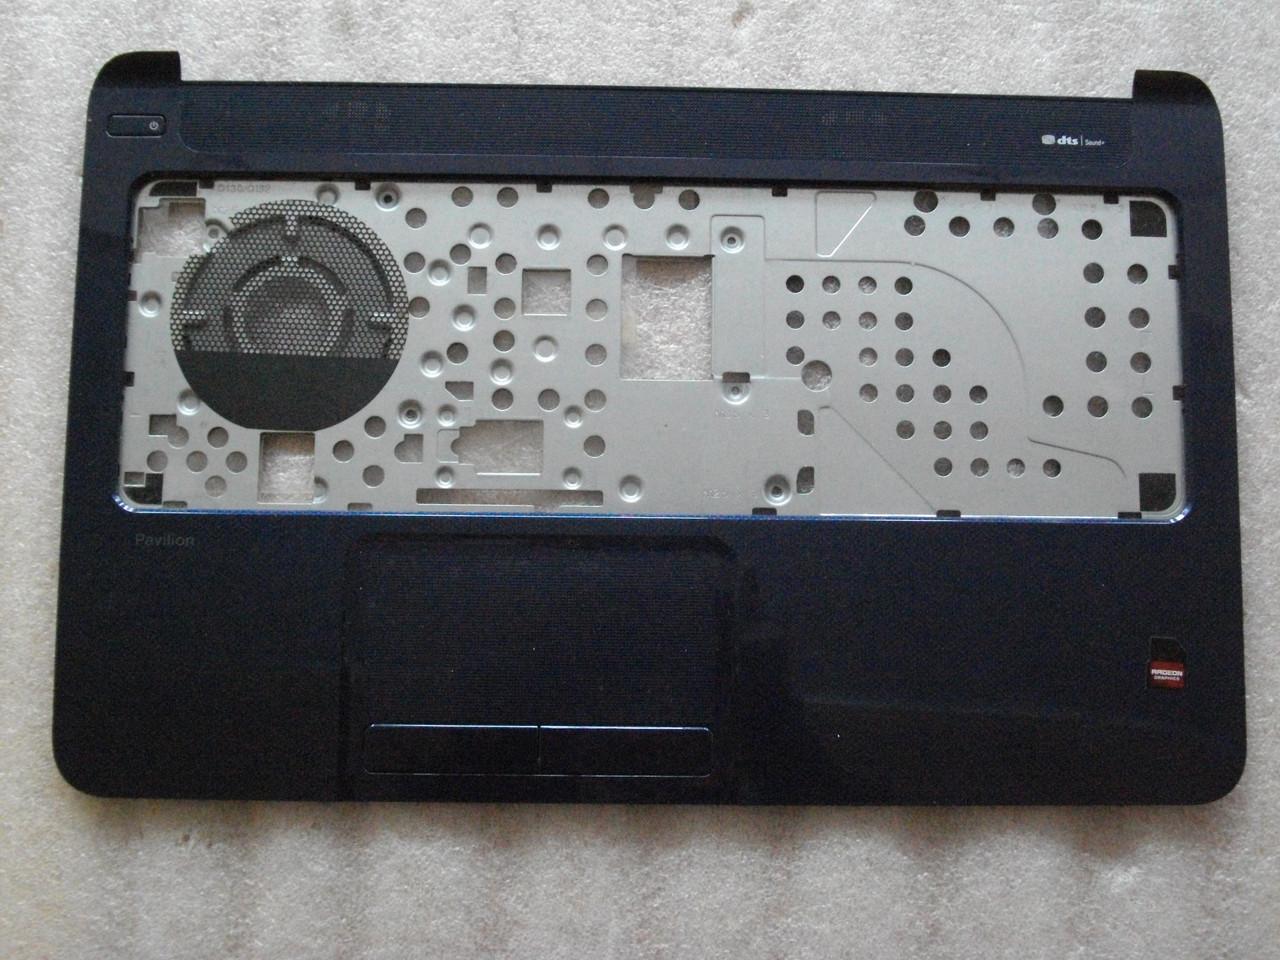 Корпус Каркас Средняя часть, верхняя часть корпуса с тачпадом HP Pavilion 15-n, 15-n231sr, JTE39U86TP603A7N041